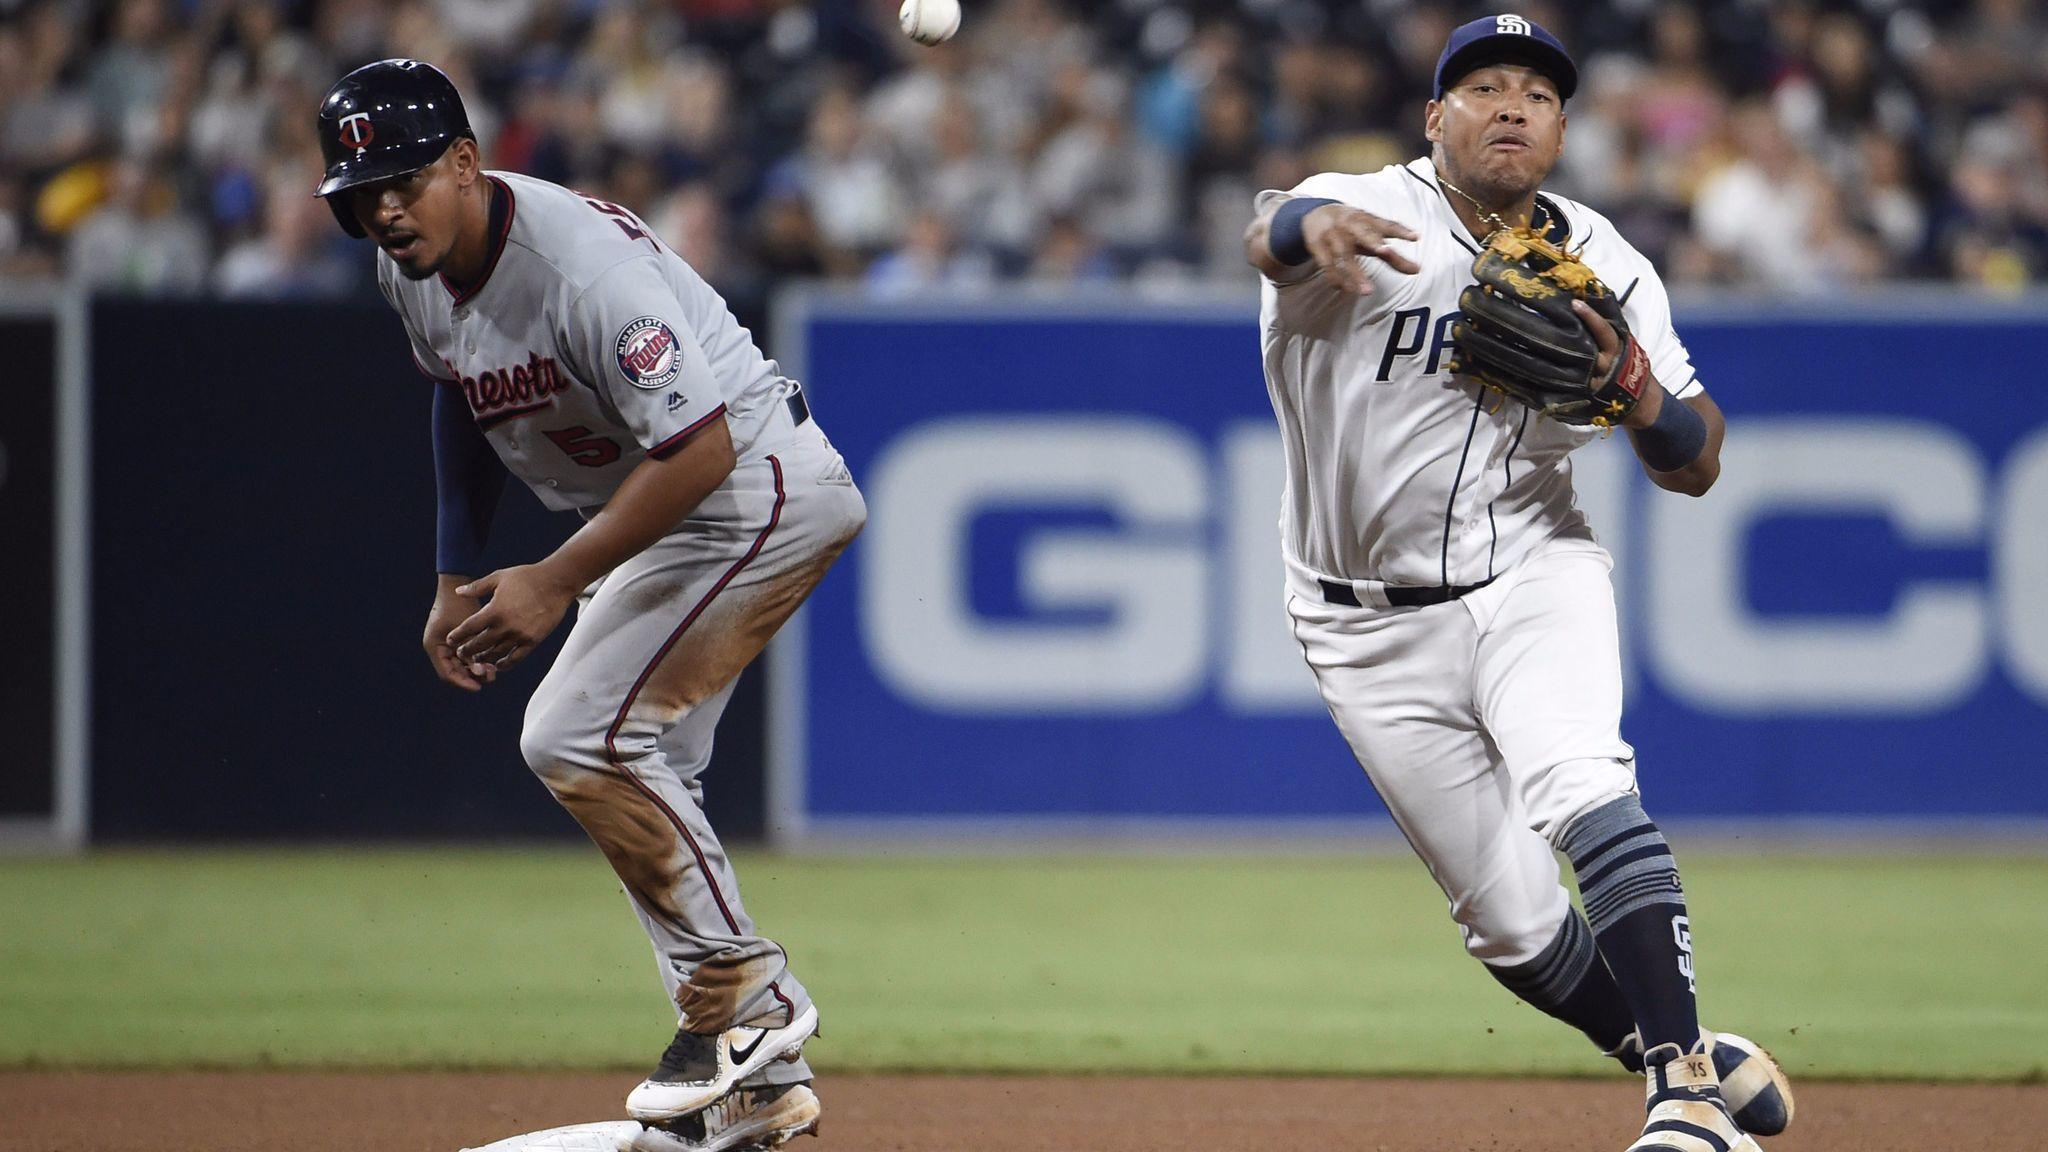 Sd-sp-padres-yangervis-solarte-testing-moves-at-shortstop-20170815